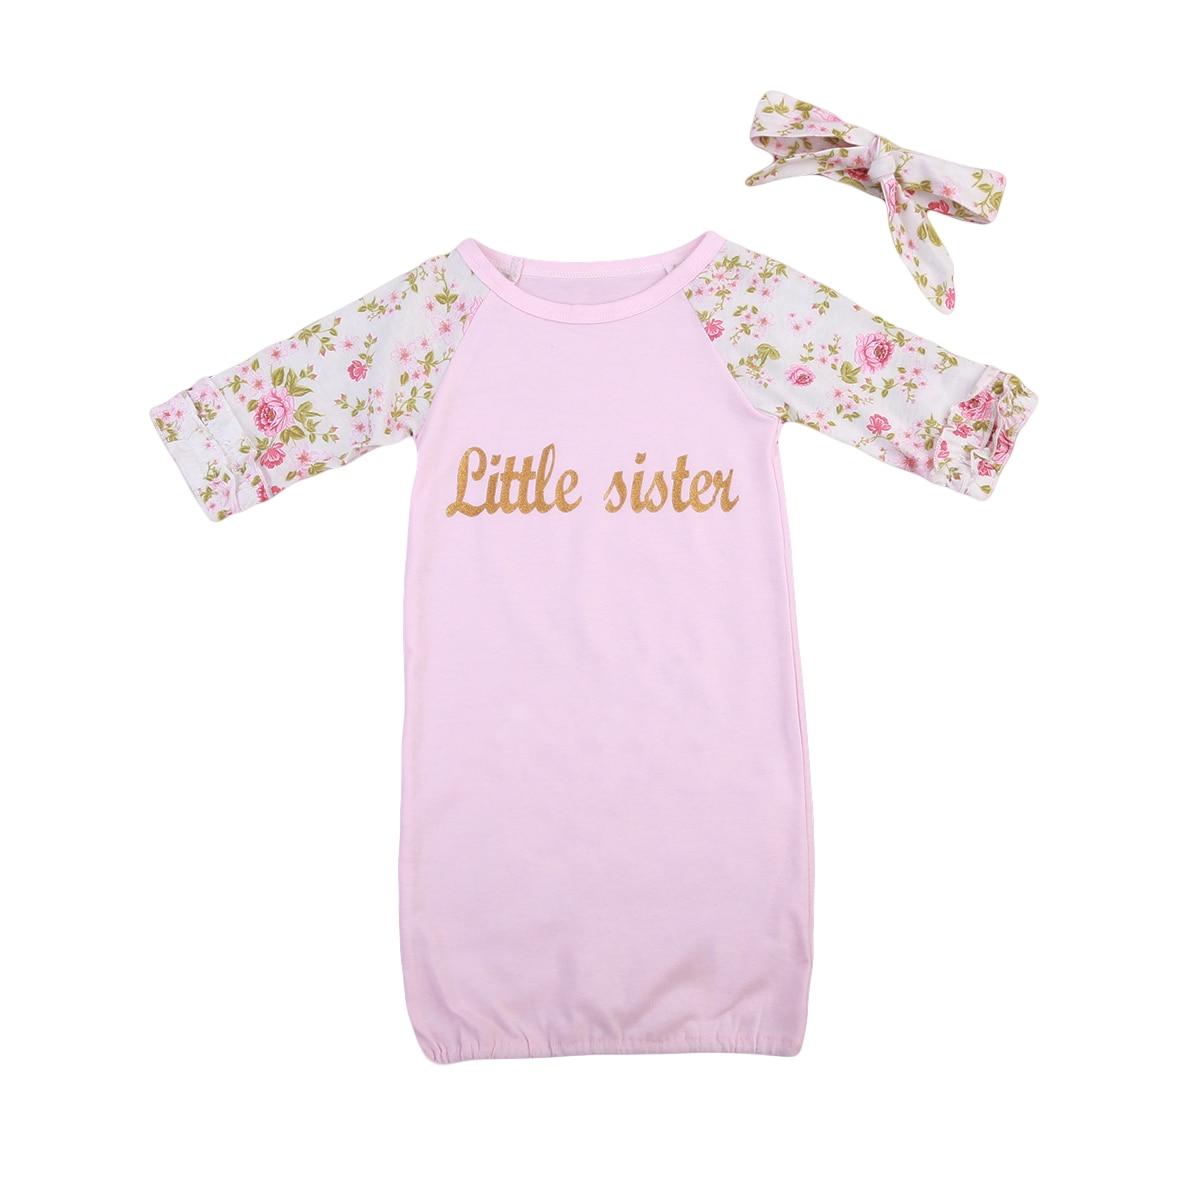 2017 Bambino Appena Nato Infantile Molle Fasciatoio Sorellina Wrap Rosa Fasce Coperta Patchwork Sacco A Pelo 0-24 M